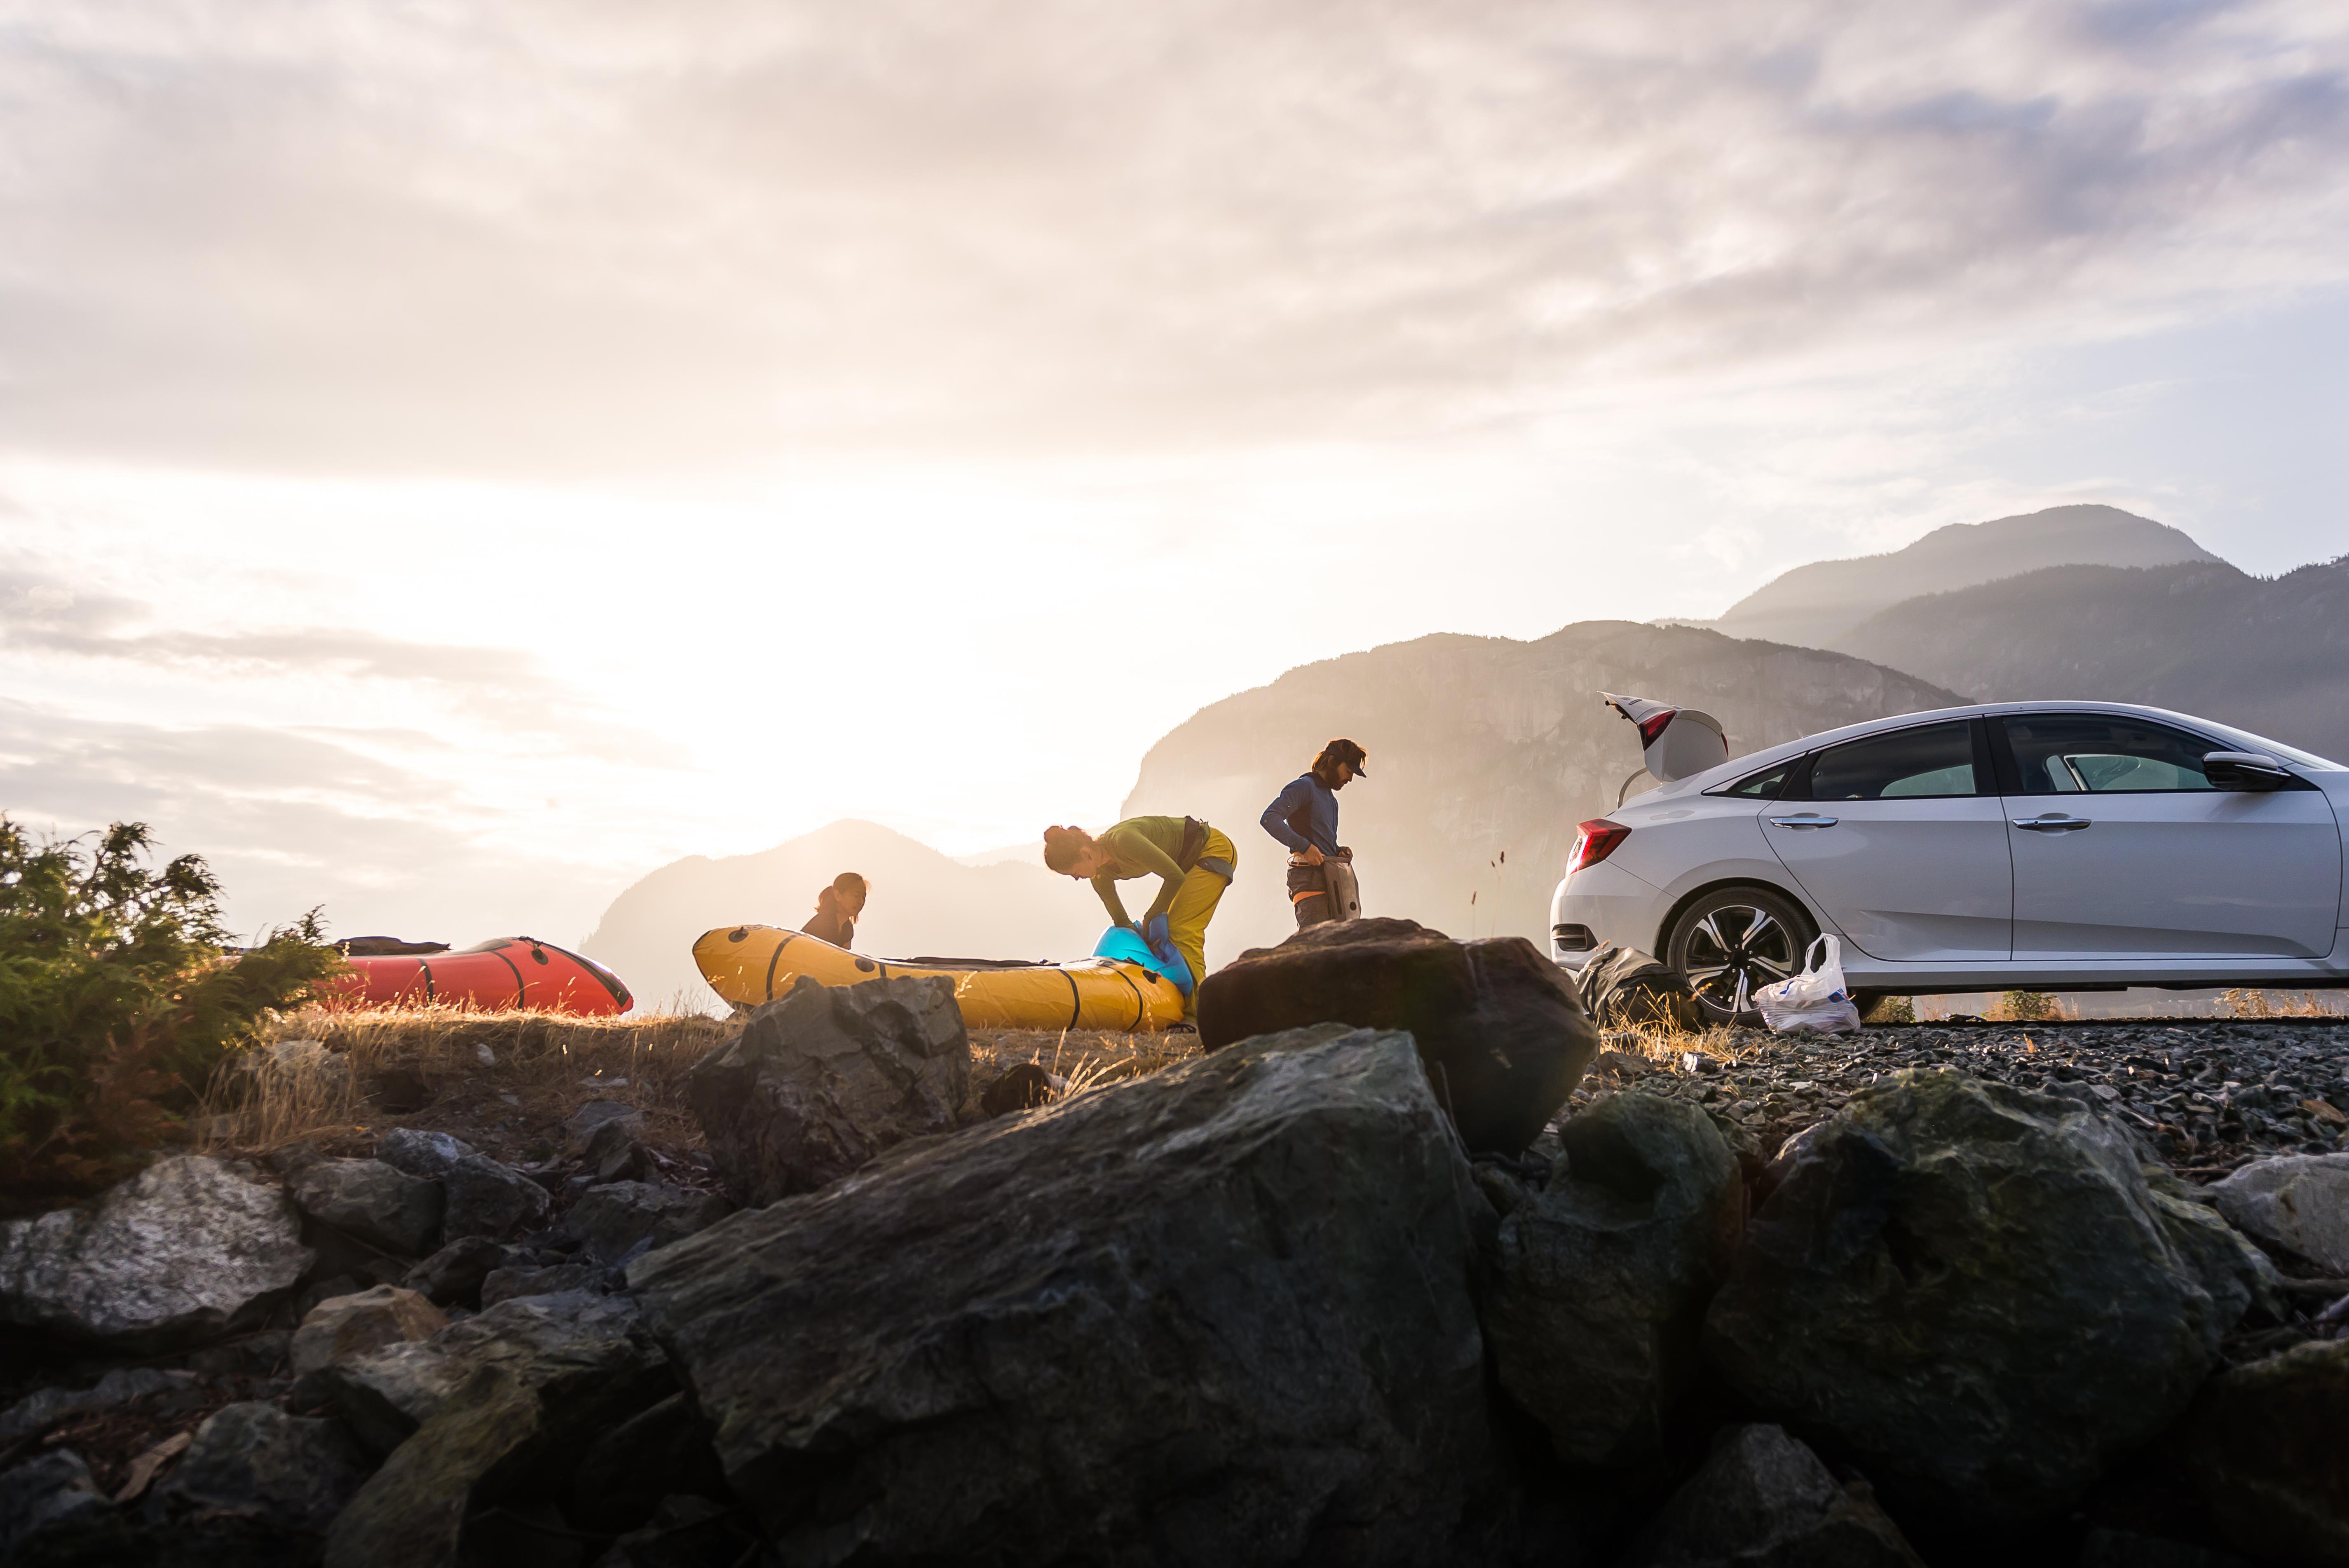 Bil kajakk friluftsliv fjell